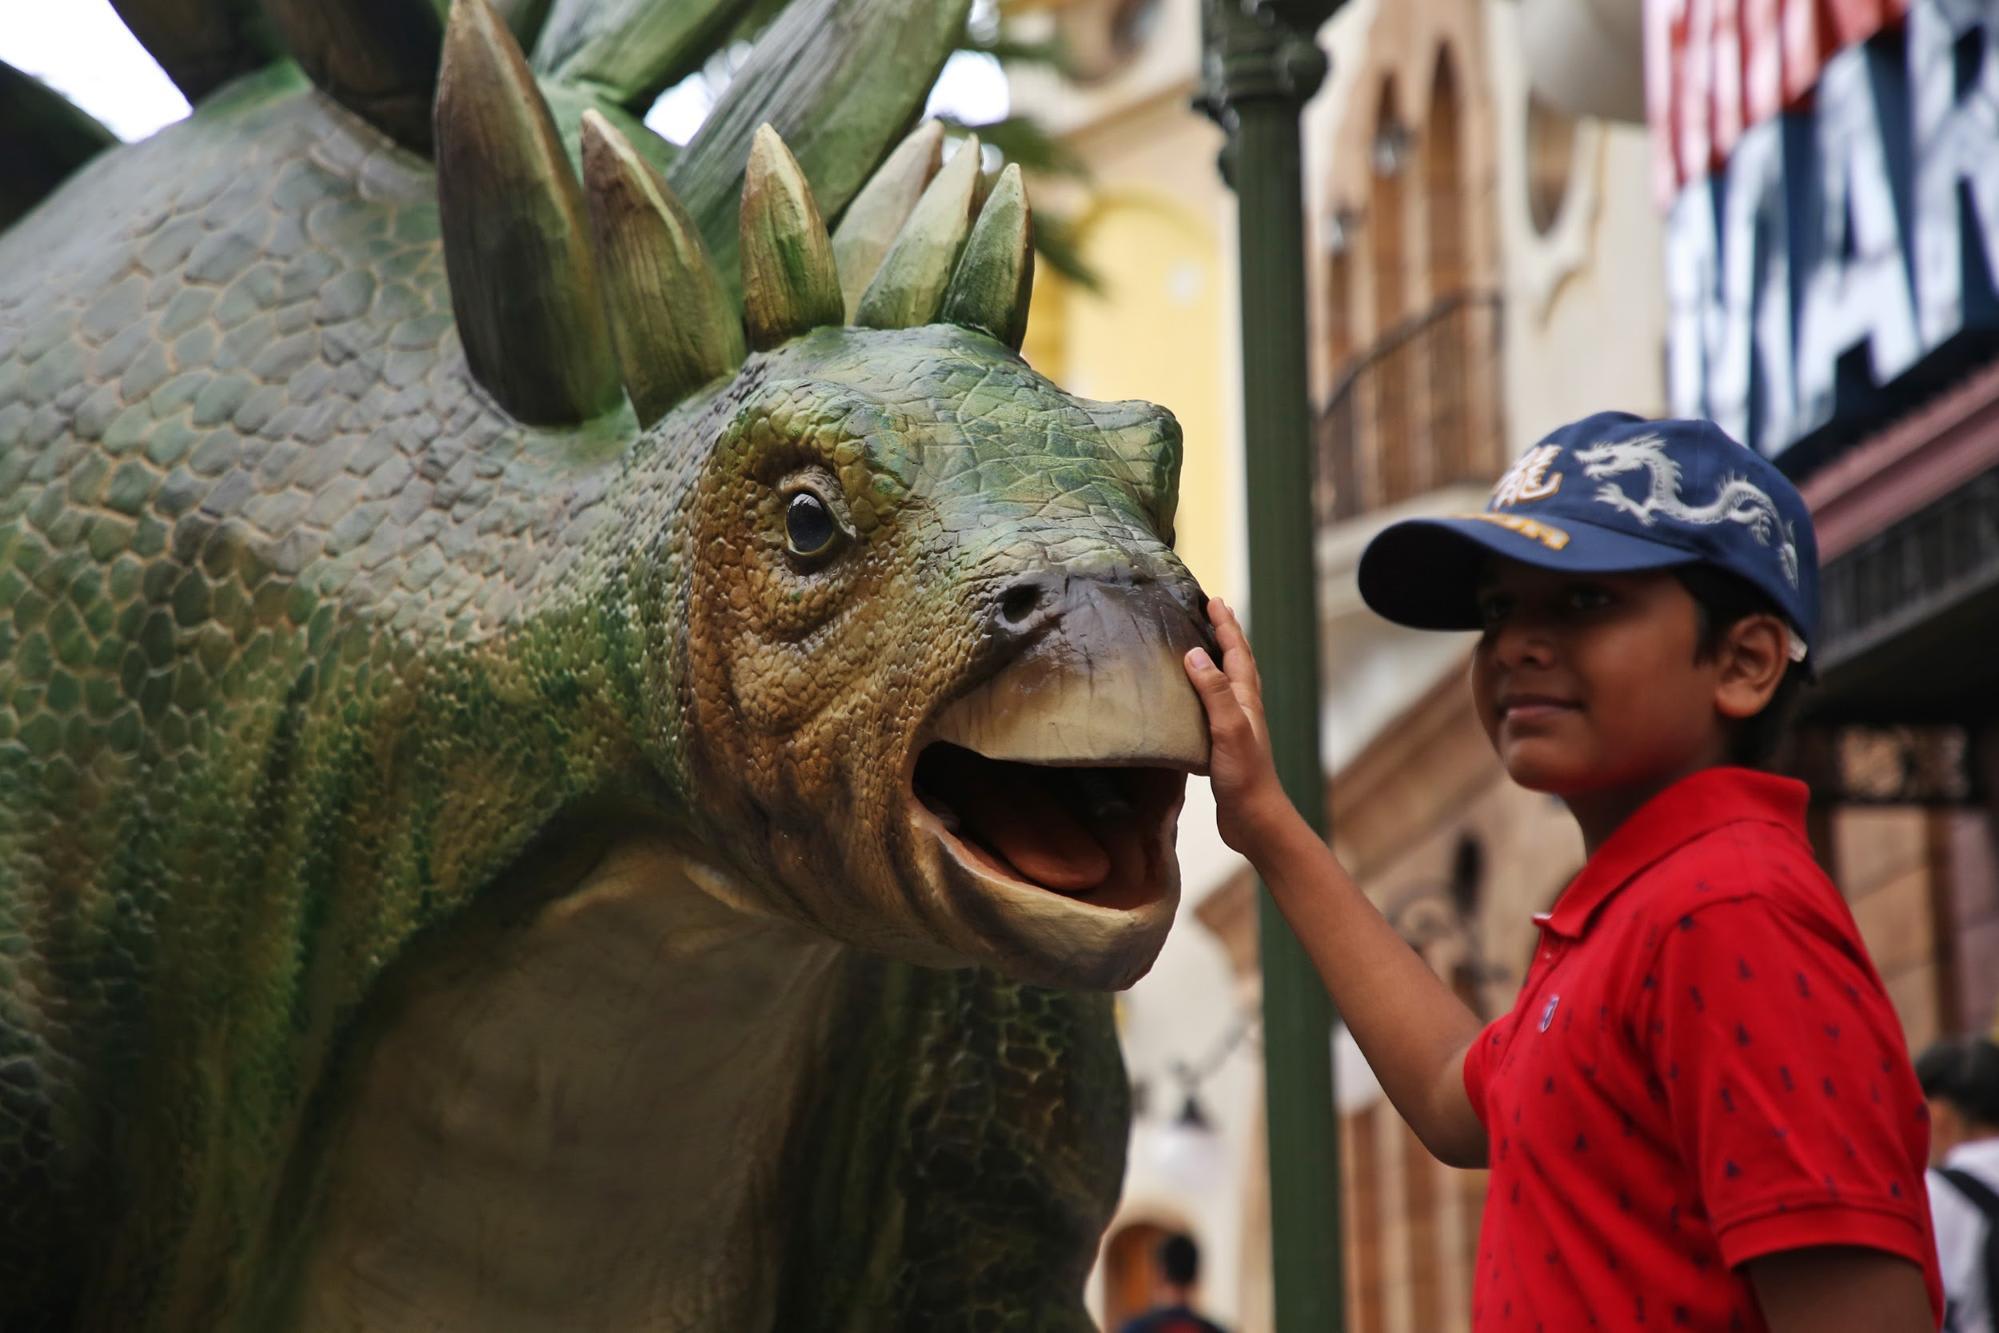 Jurassic World Dinosaurs Universal Studios Singapore